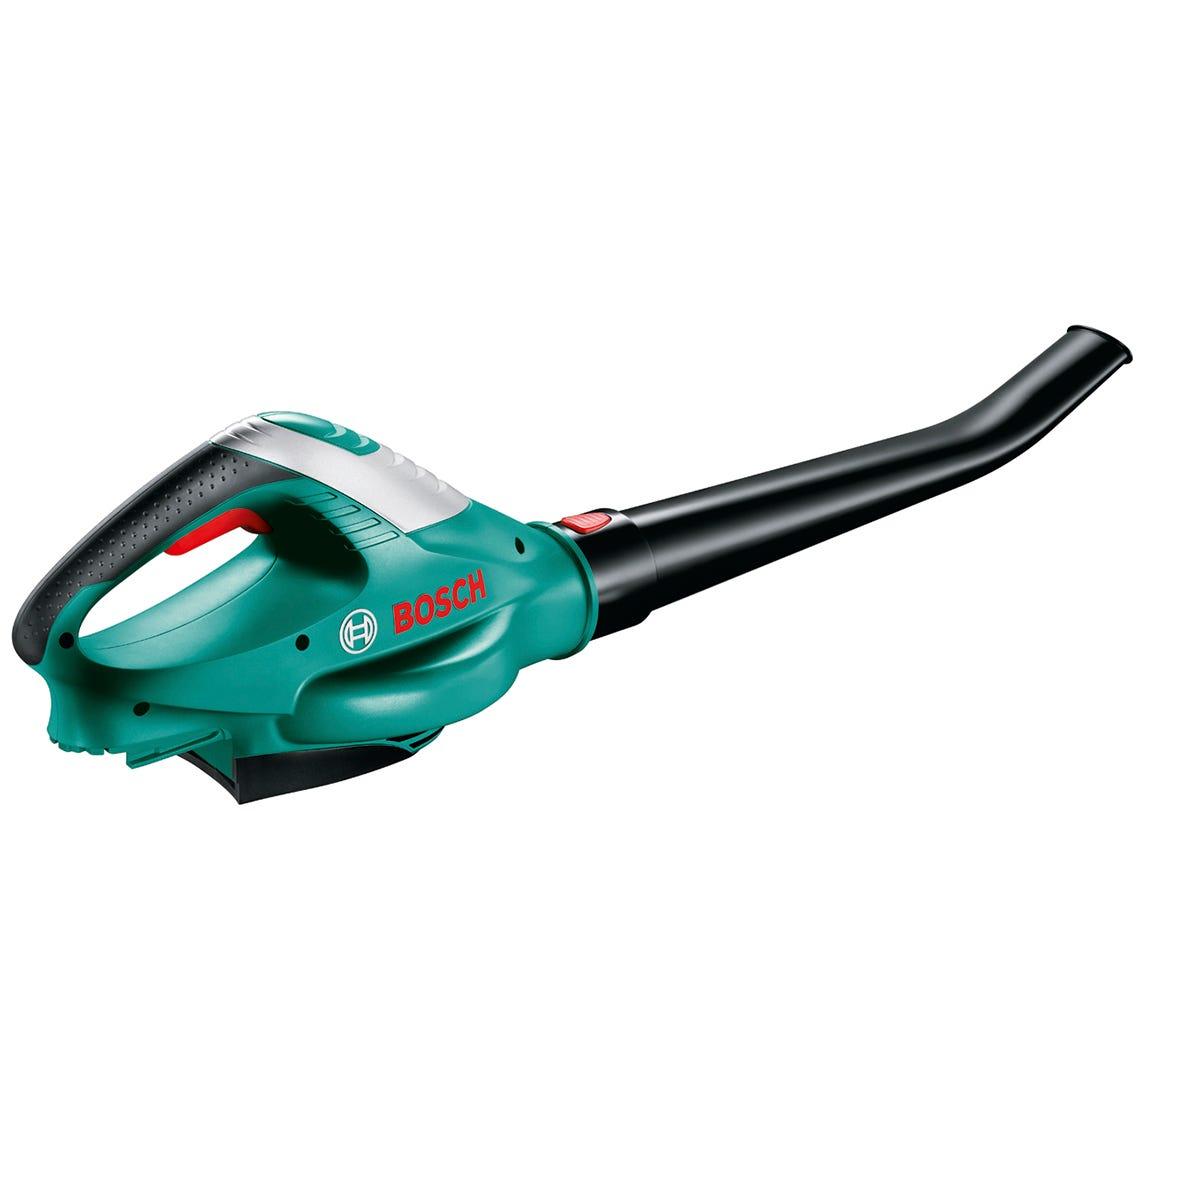 Bosch ALB 18 LI Cordless Leaf Blower (Baretool)